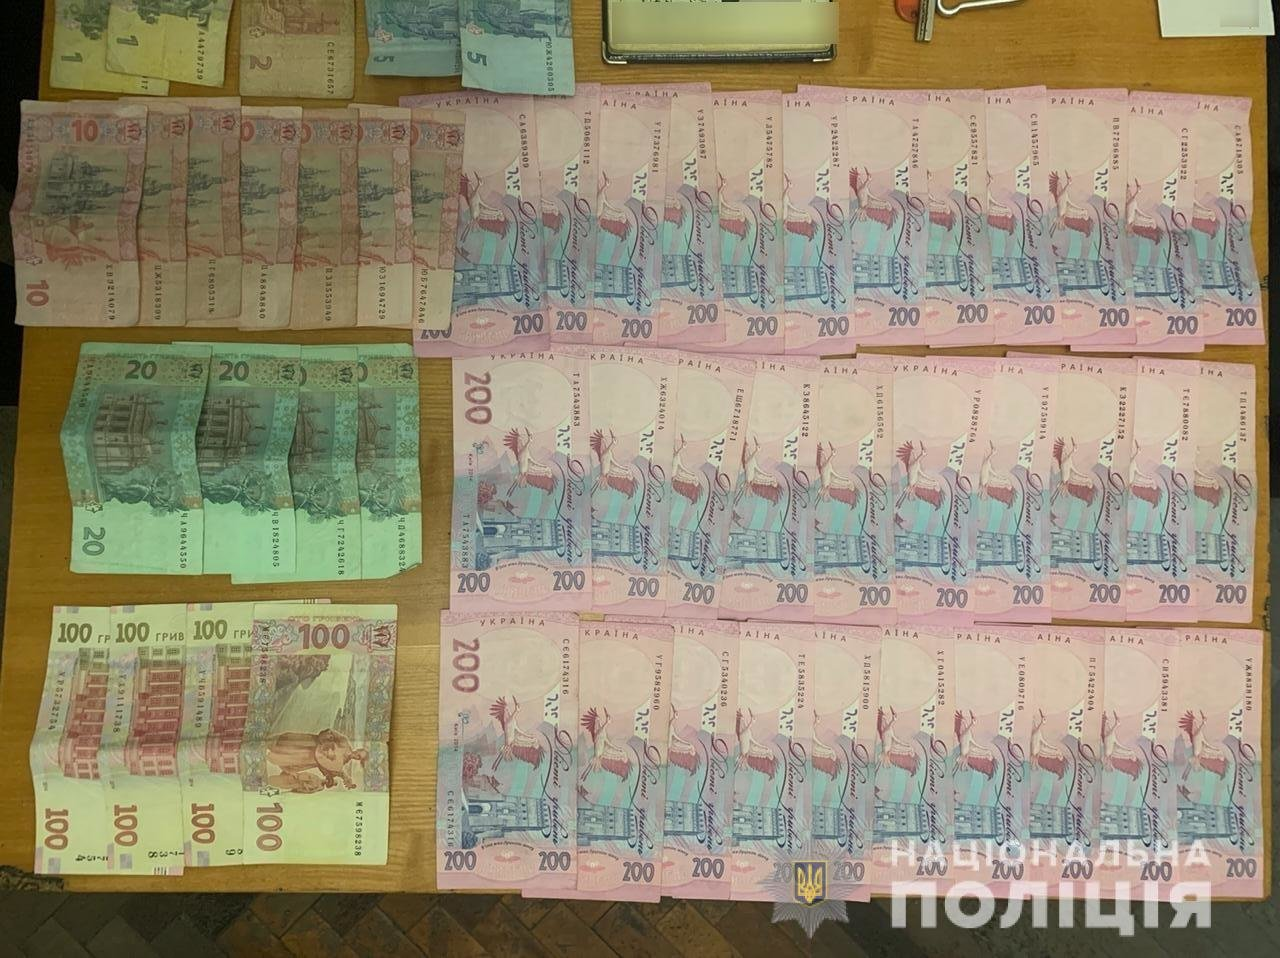 200 грн за голос: под Киевом за подкуп избирателей задержали мужчину, ФОТО, фото-1